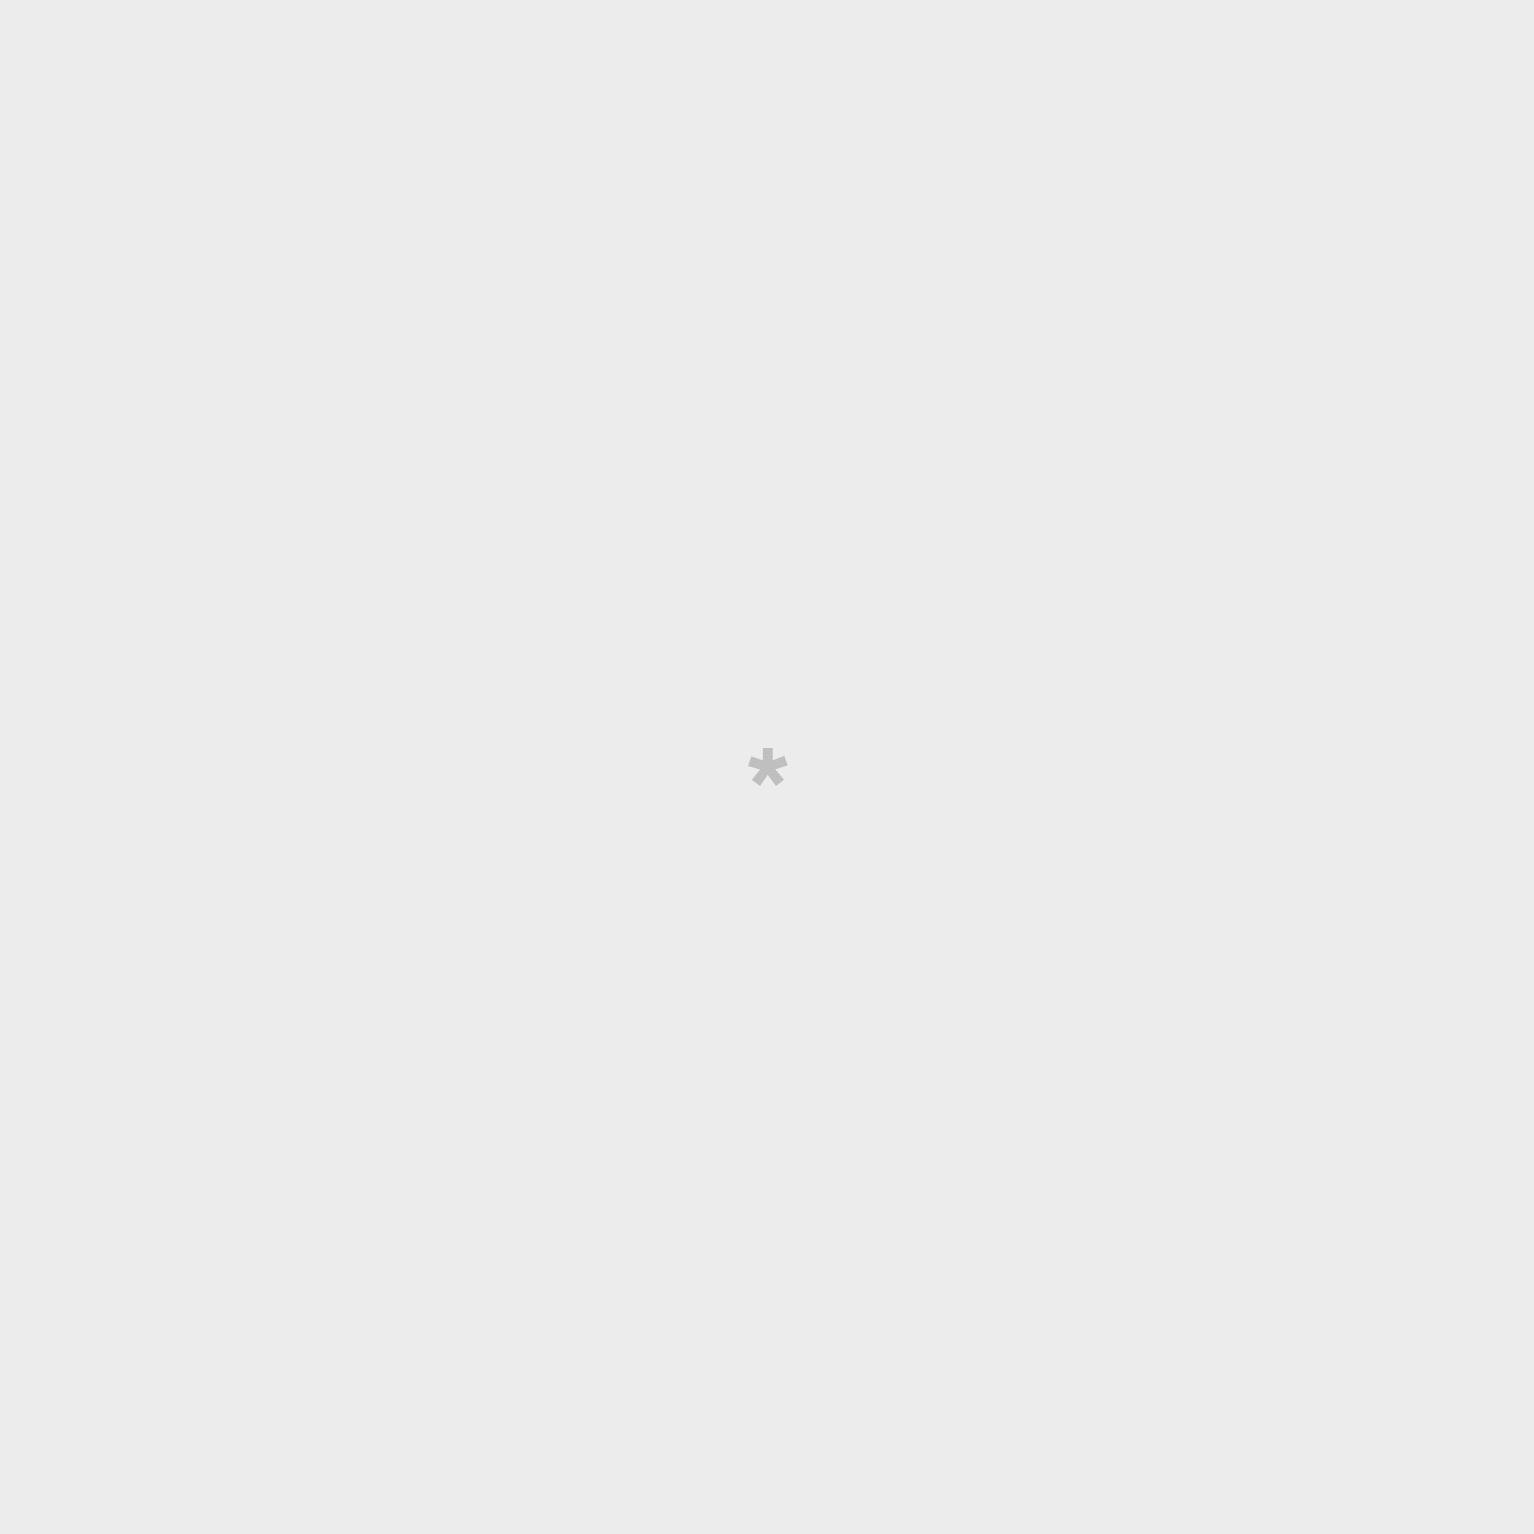 Guarda-chuva pequeno de viagem - Today is my day (in the rain)